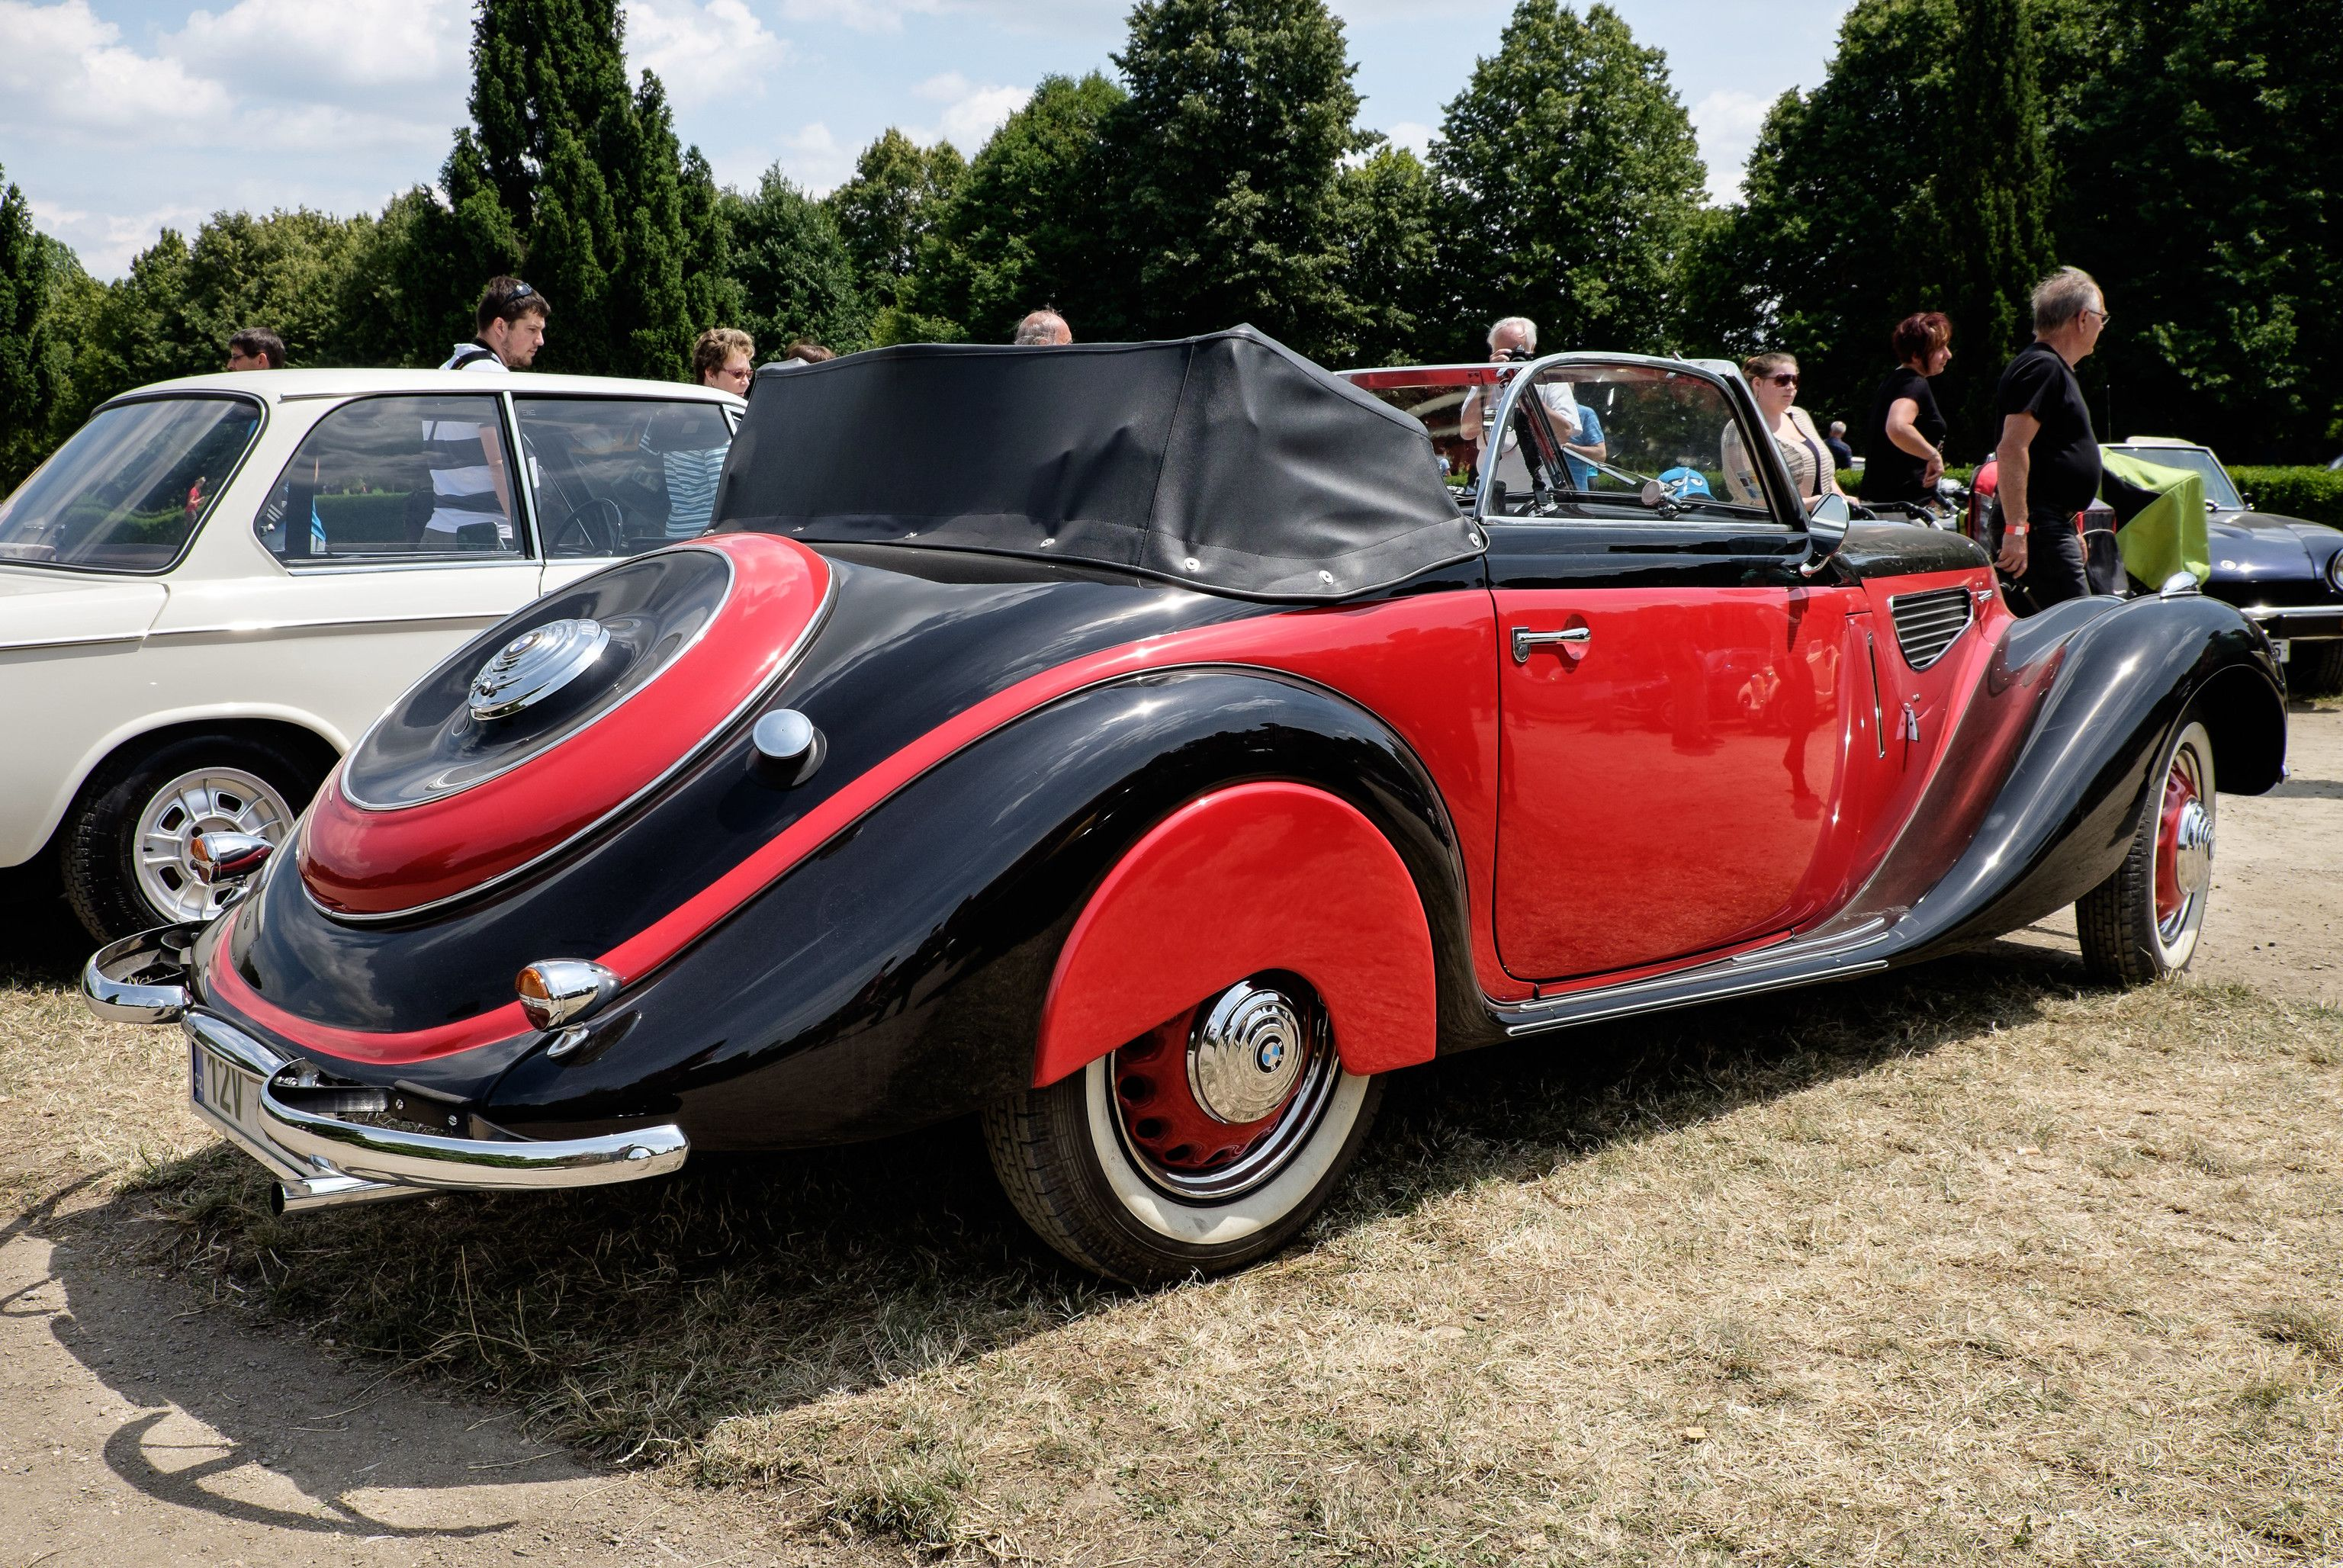 BMW 328 red-black combo | Bmw 328, Bmw, Black color ...